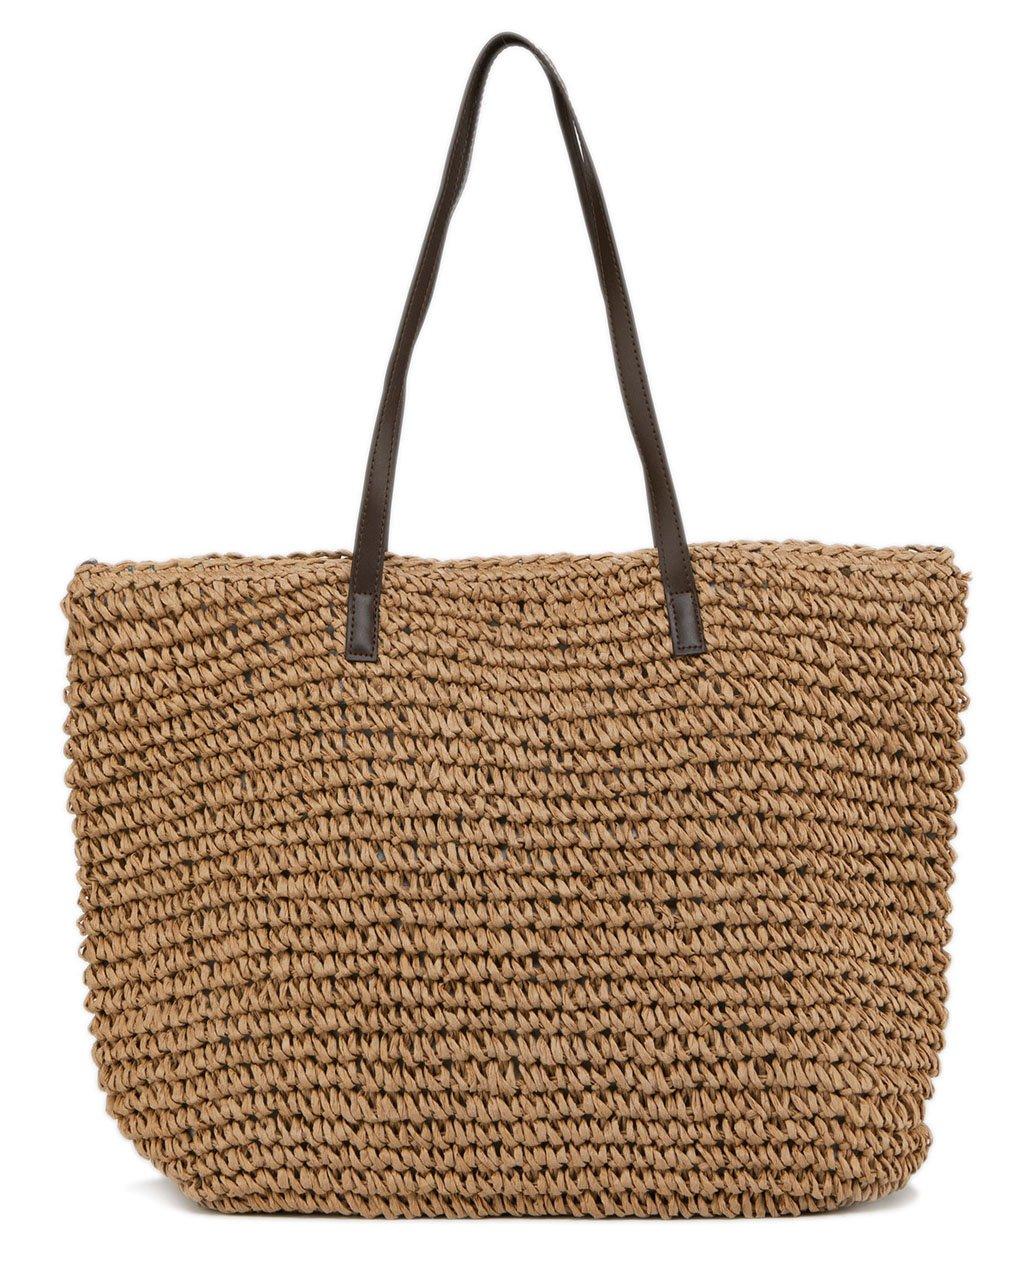 ilishop Women's Classic Straw Summer Beach Sea Shoulder Bag Handbag Tote (Brown)